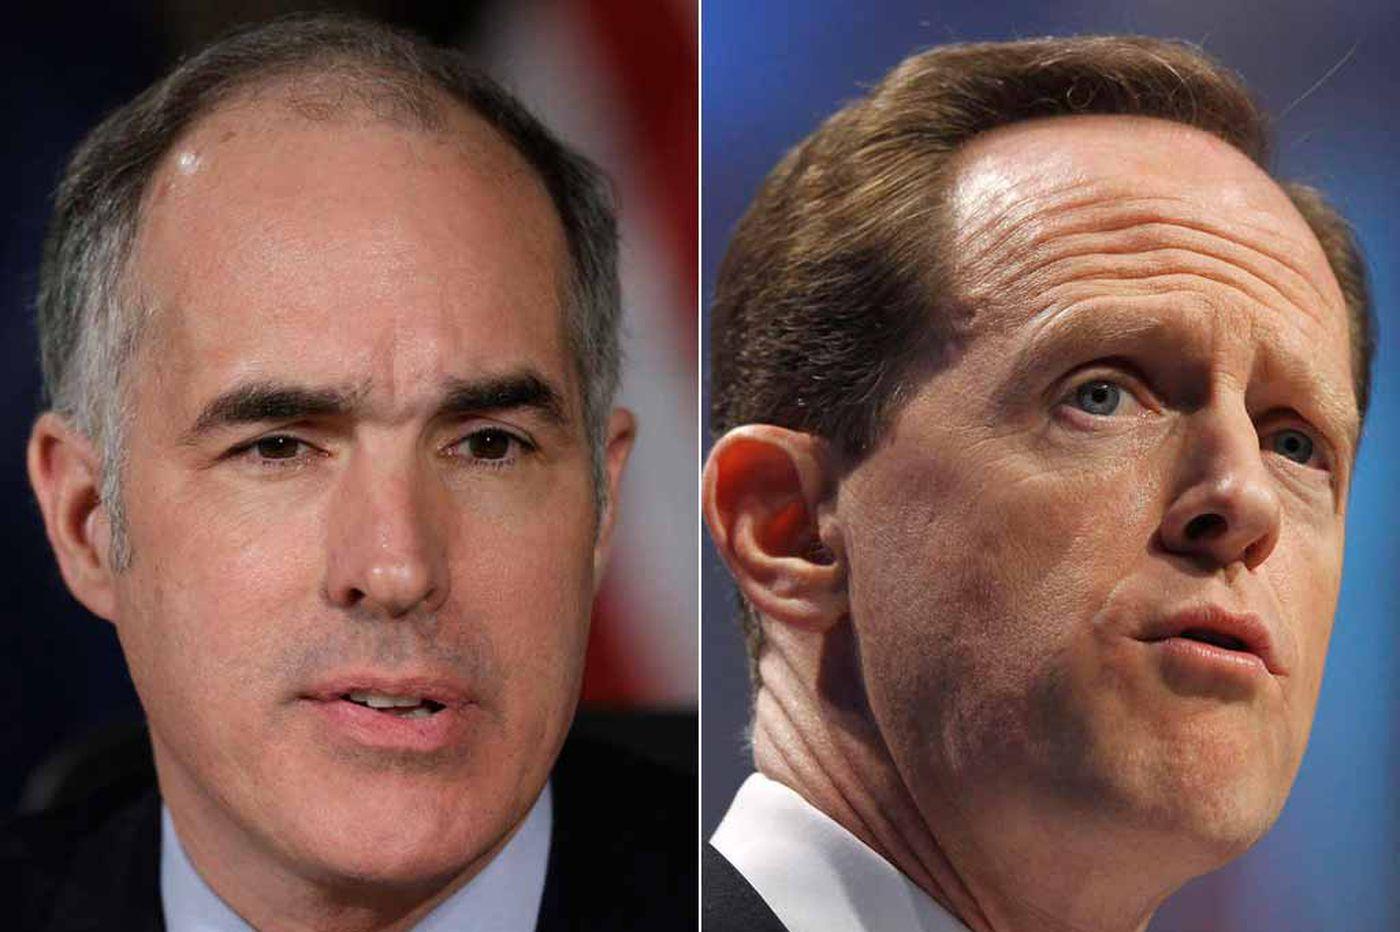 Pa. senators hold the key to federal prison reform | Opinion